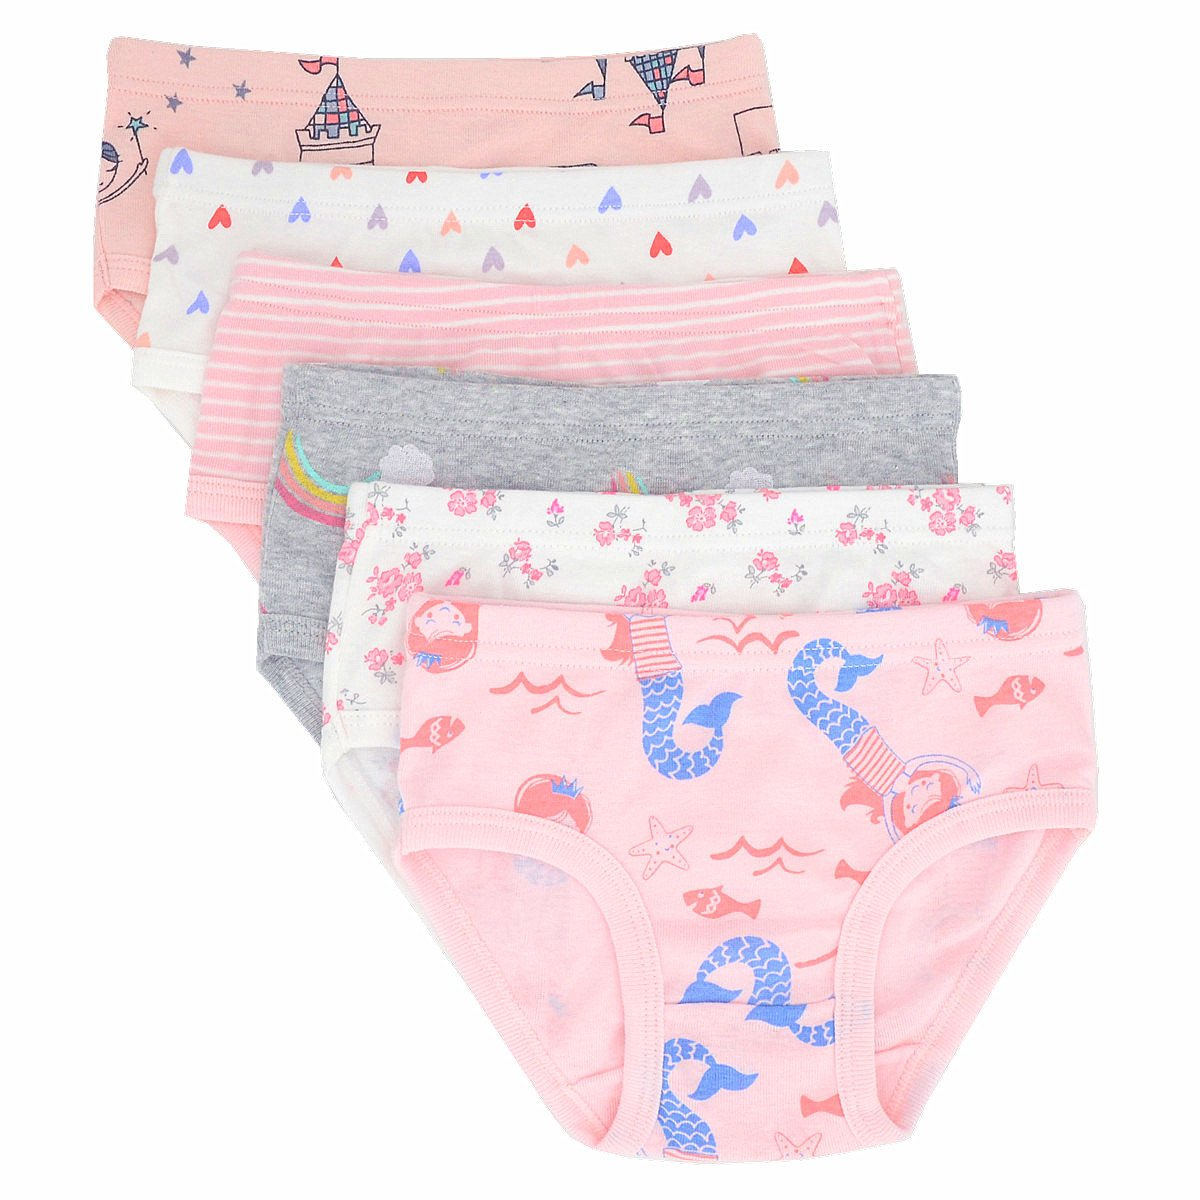 Toddler Little Girls' Briefs Panties Kids Cotton Underwear Set 6 Pack